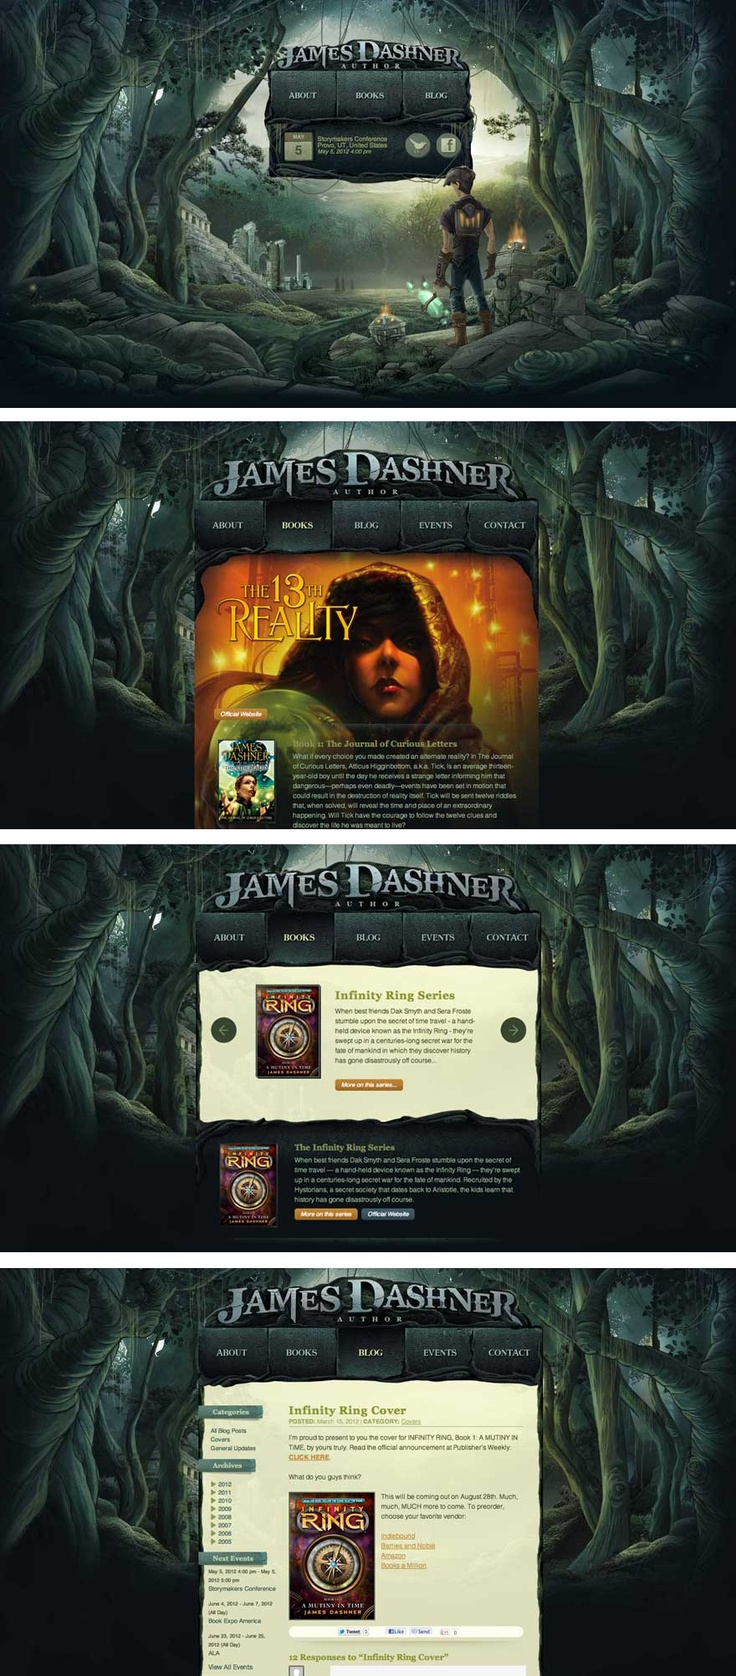 web-design website site author surreal fantasy game illustration graphic   source: http://www.jamesdashner.com/